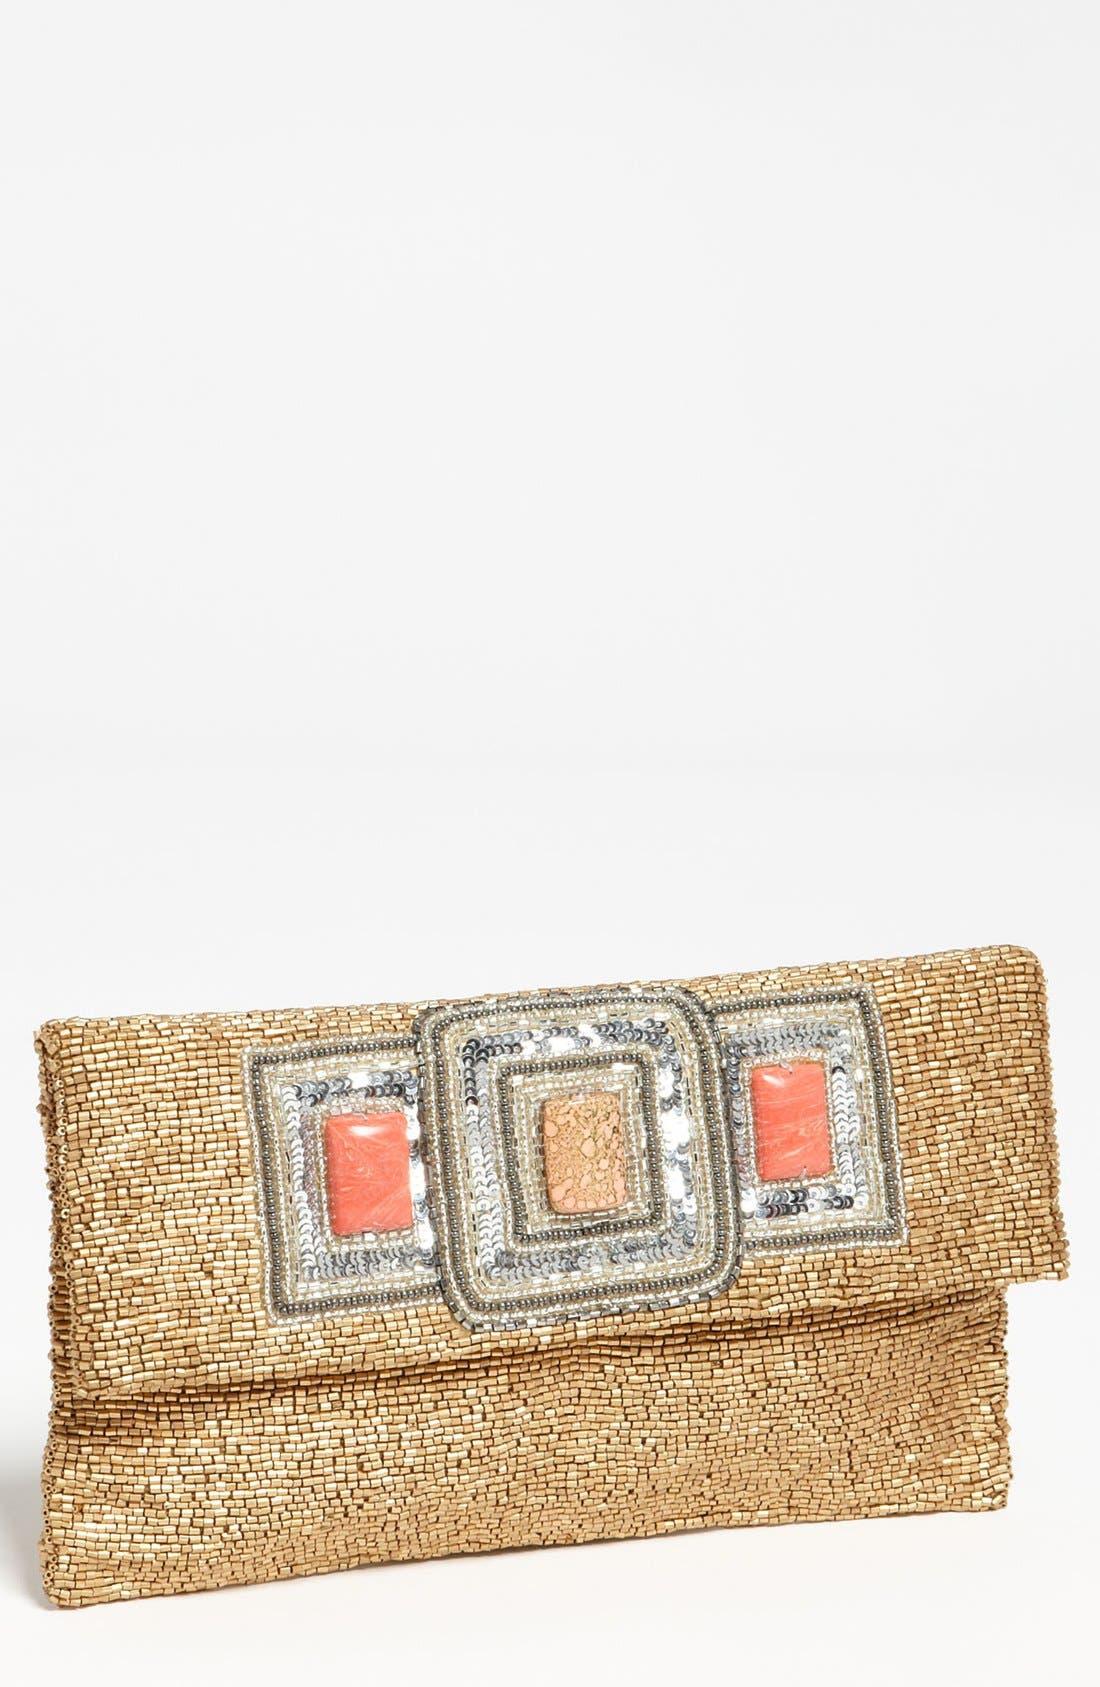 Alternate Image 1 Selected - Moyna 'Three Stone' Beaded Clutch